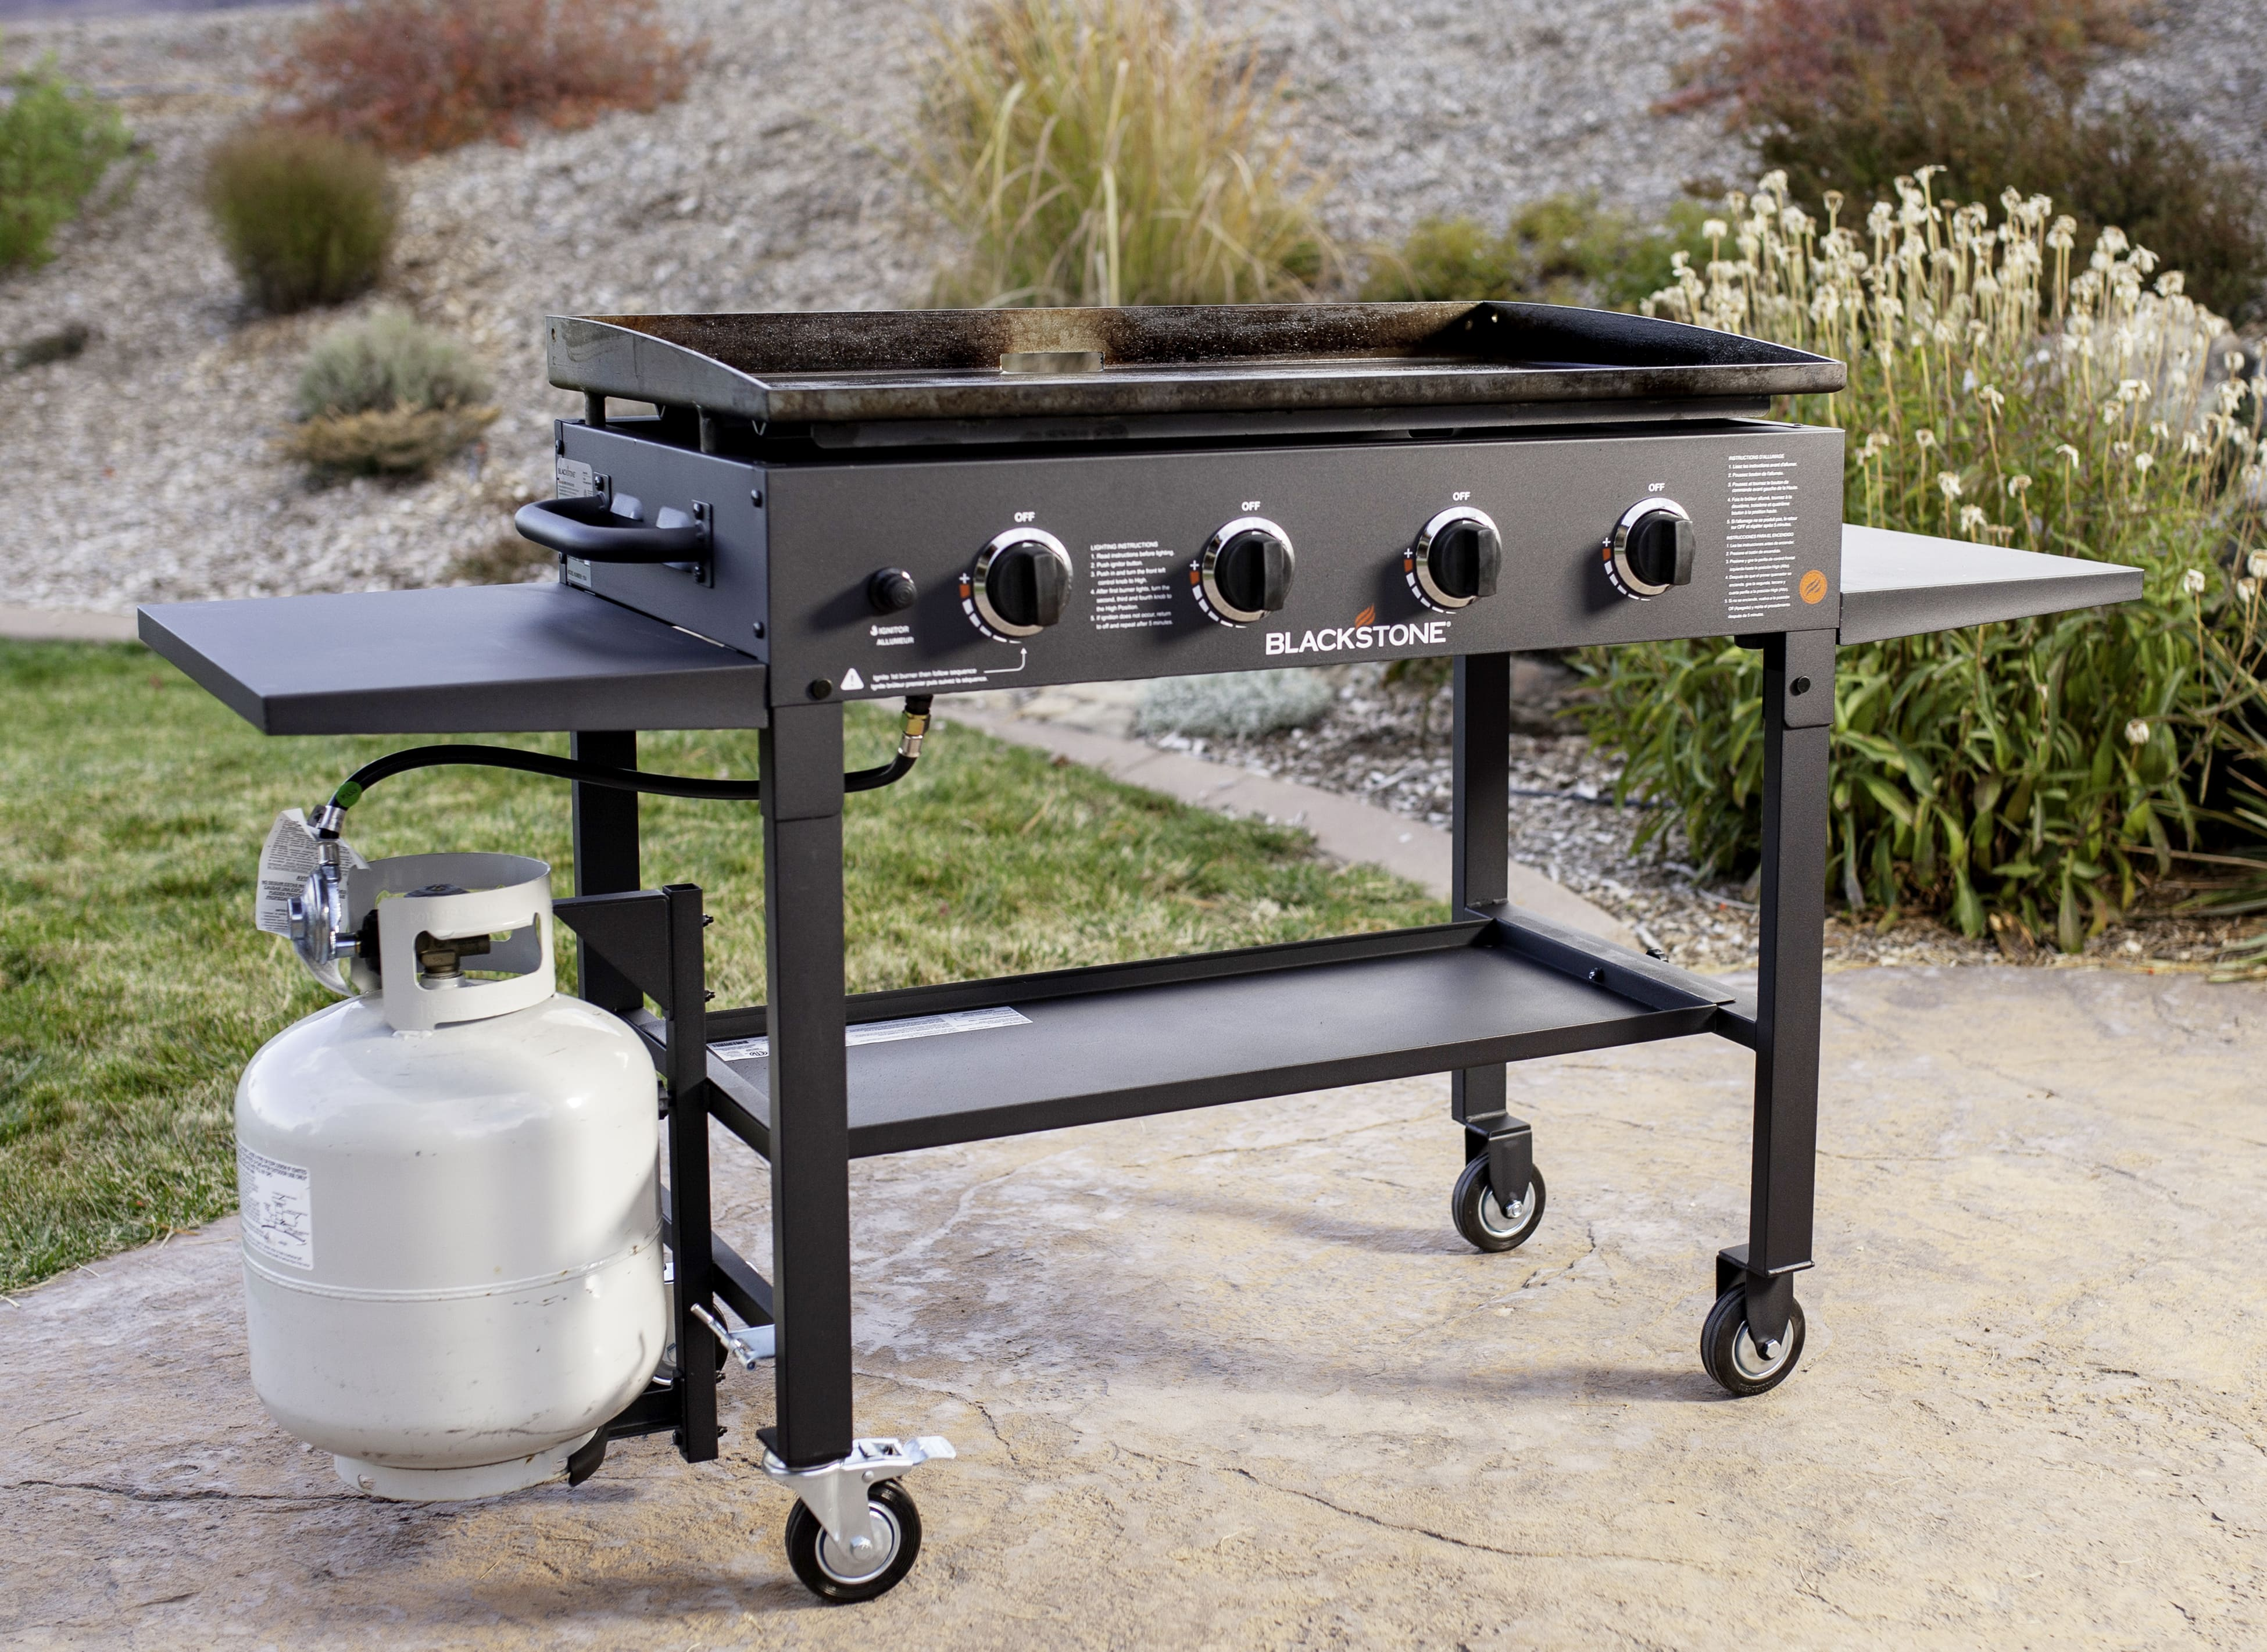 Choose outdoor best kitchen equipment for cooking